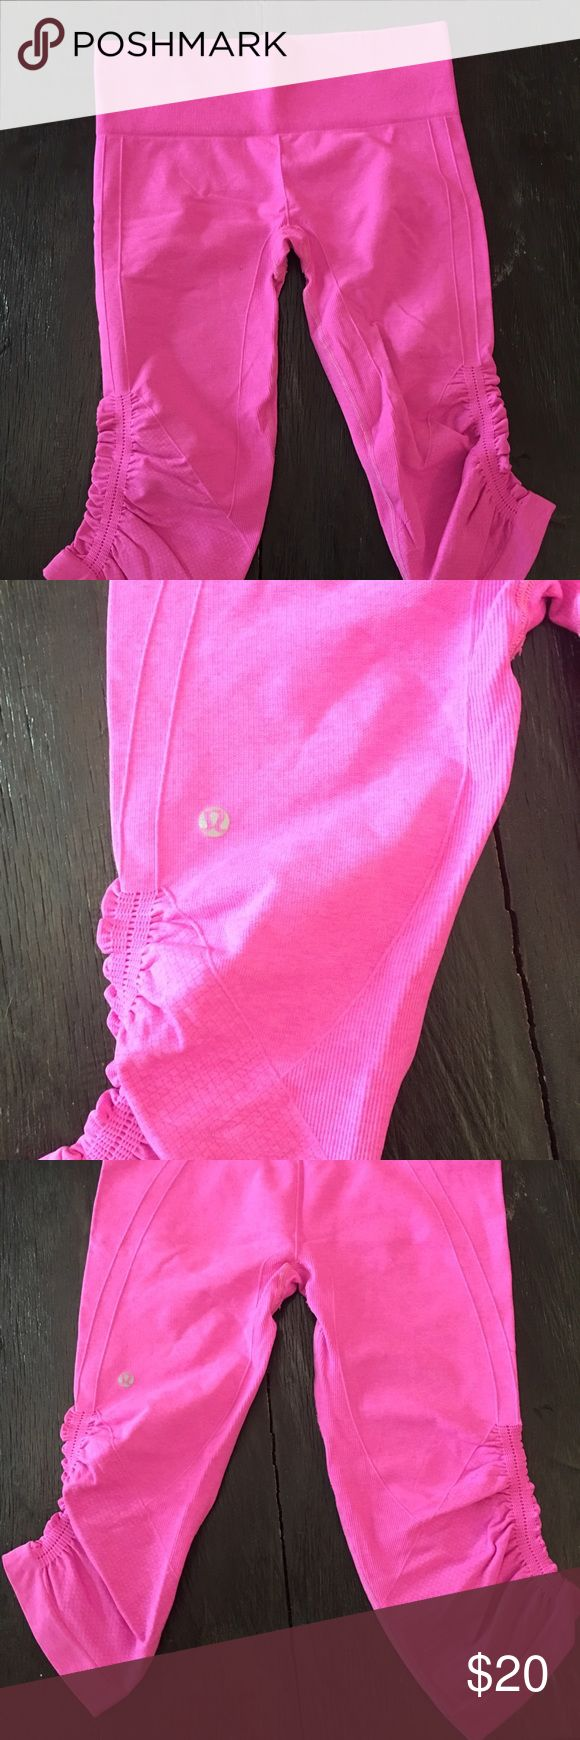 Lululemon Pink Capri Lululemon Hot Pink Capri worn twice lululemon athletica Pants Capris